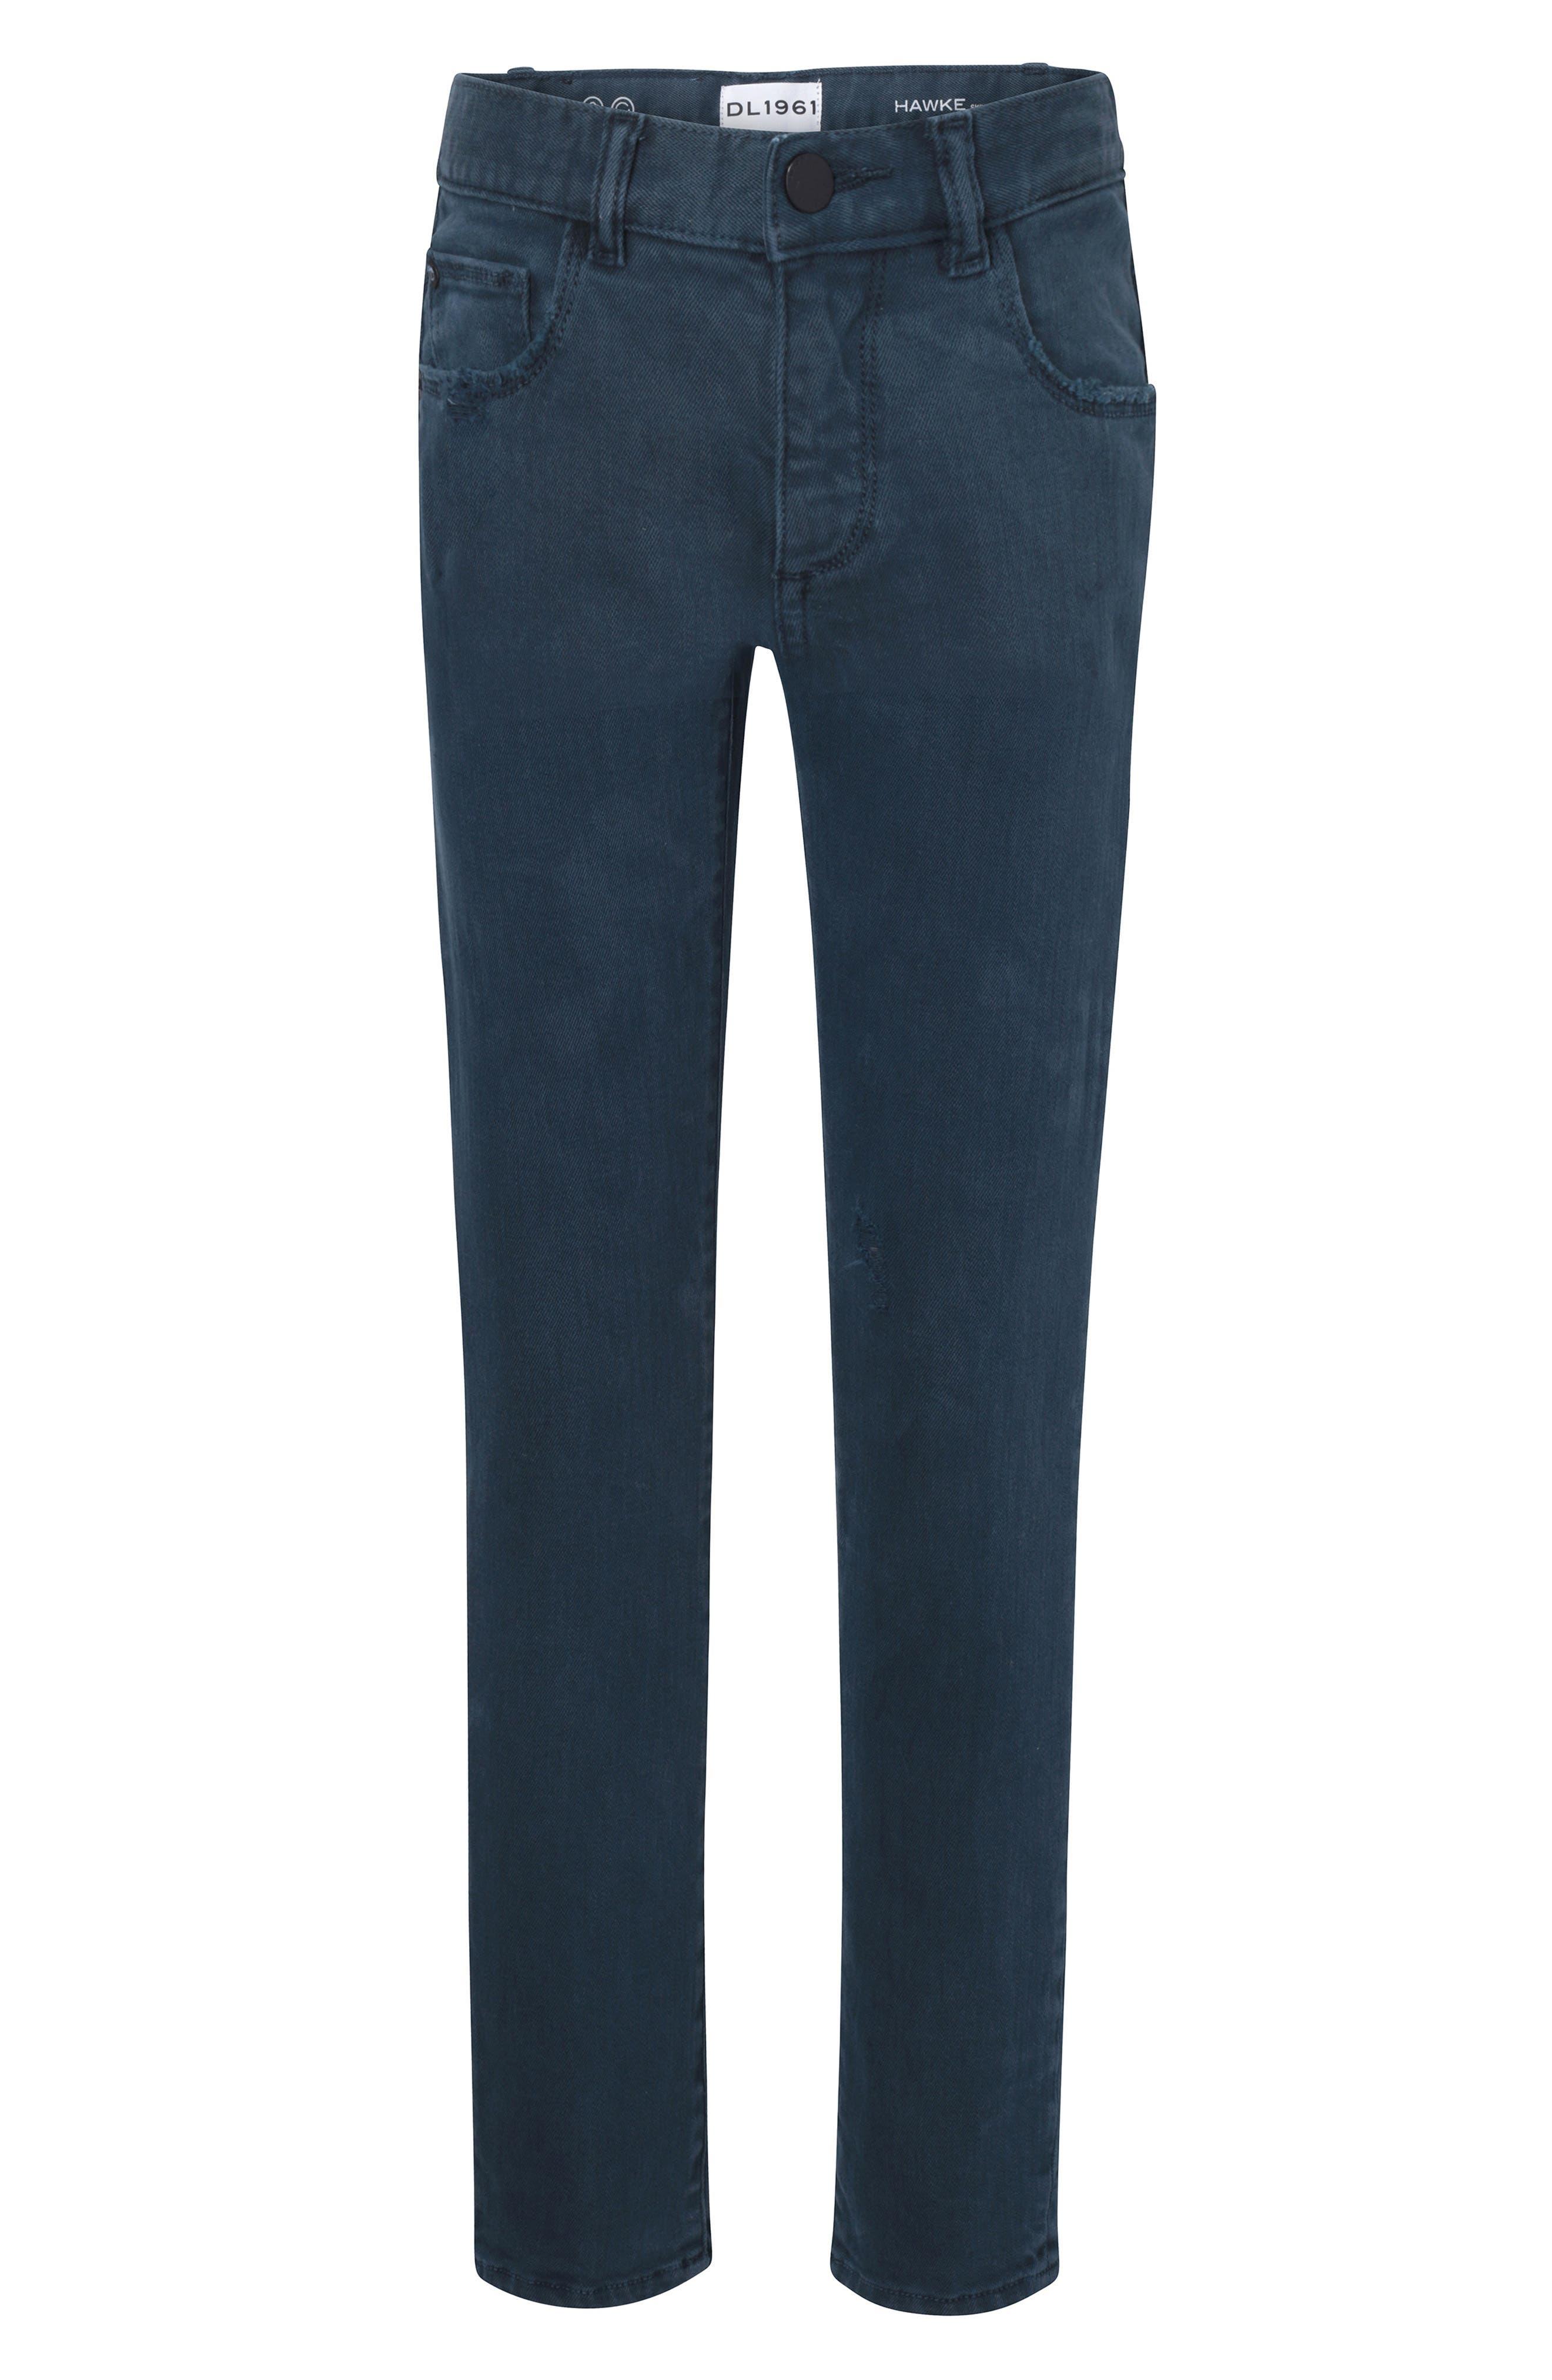 Hawke Skinny Jeans,                             Main thumbnail 1, color,                             410